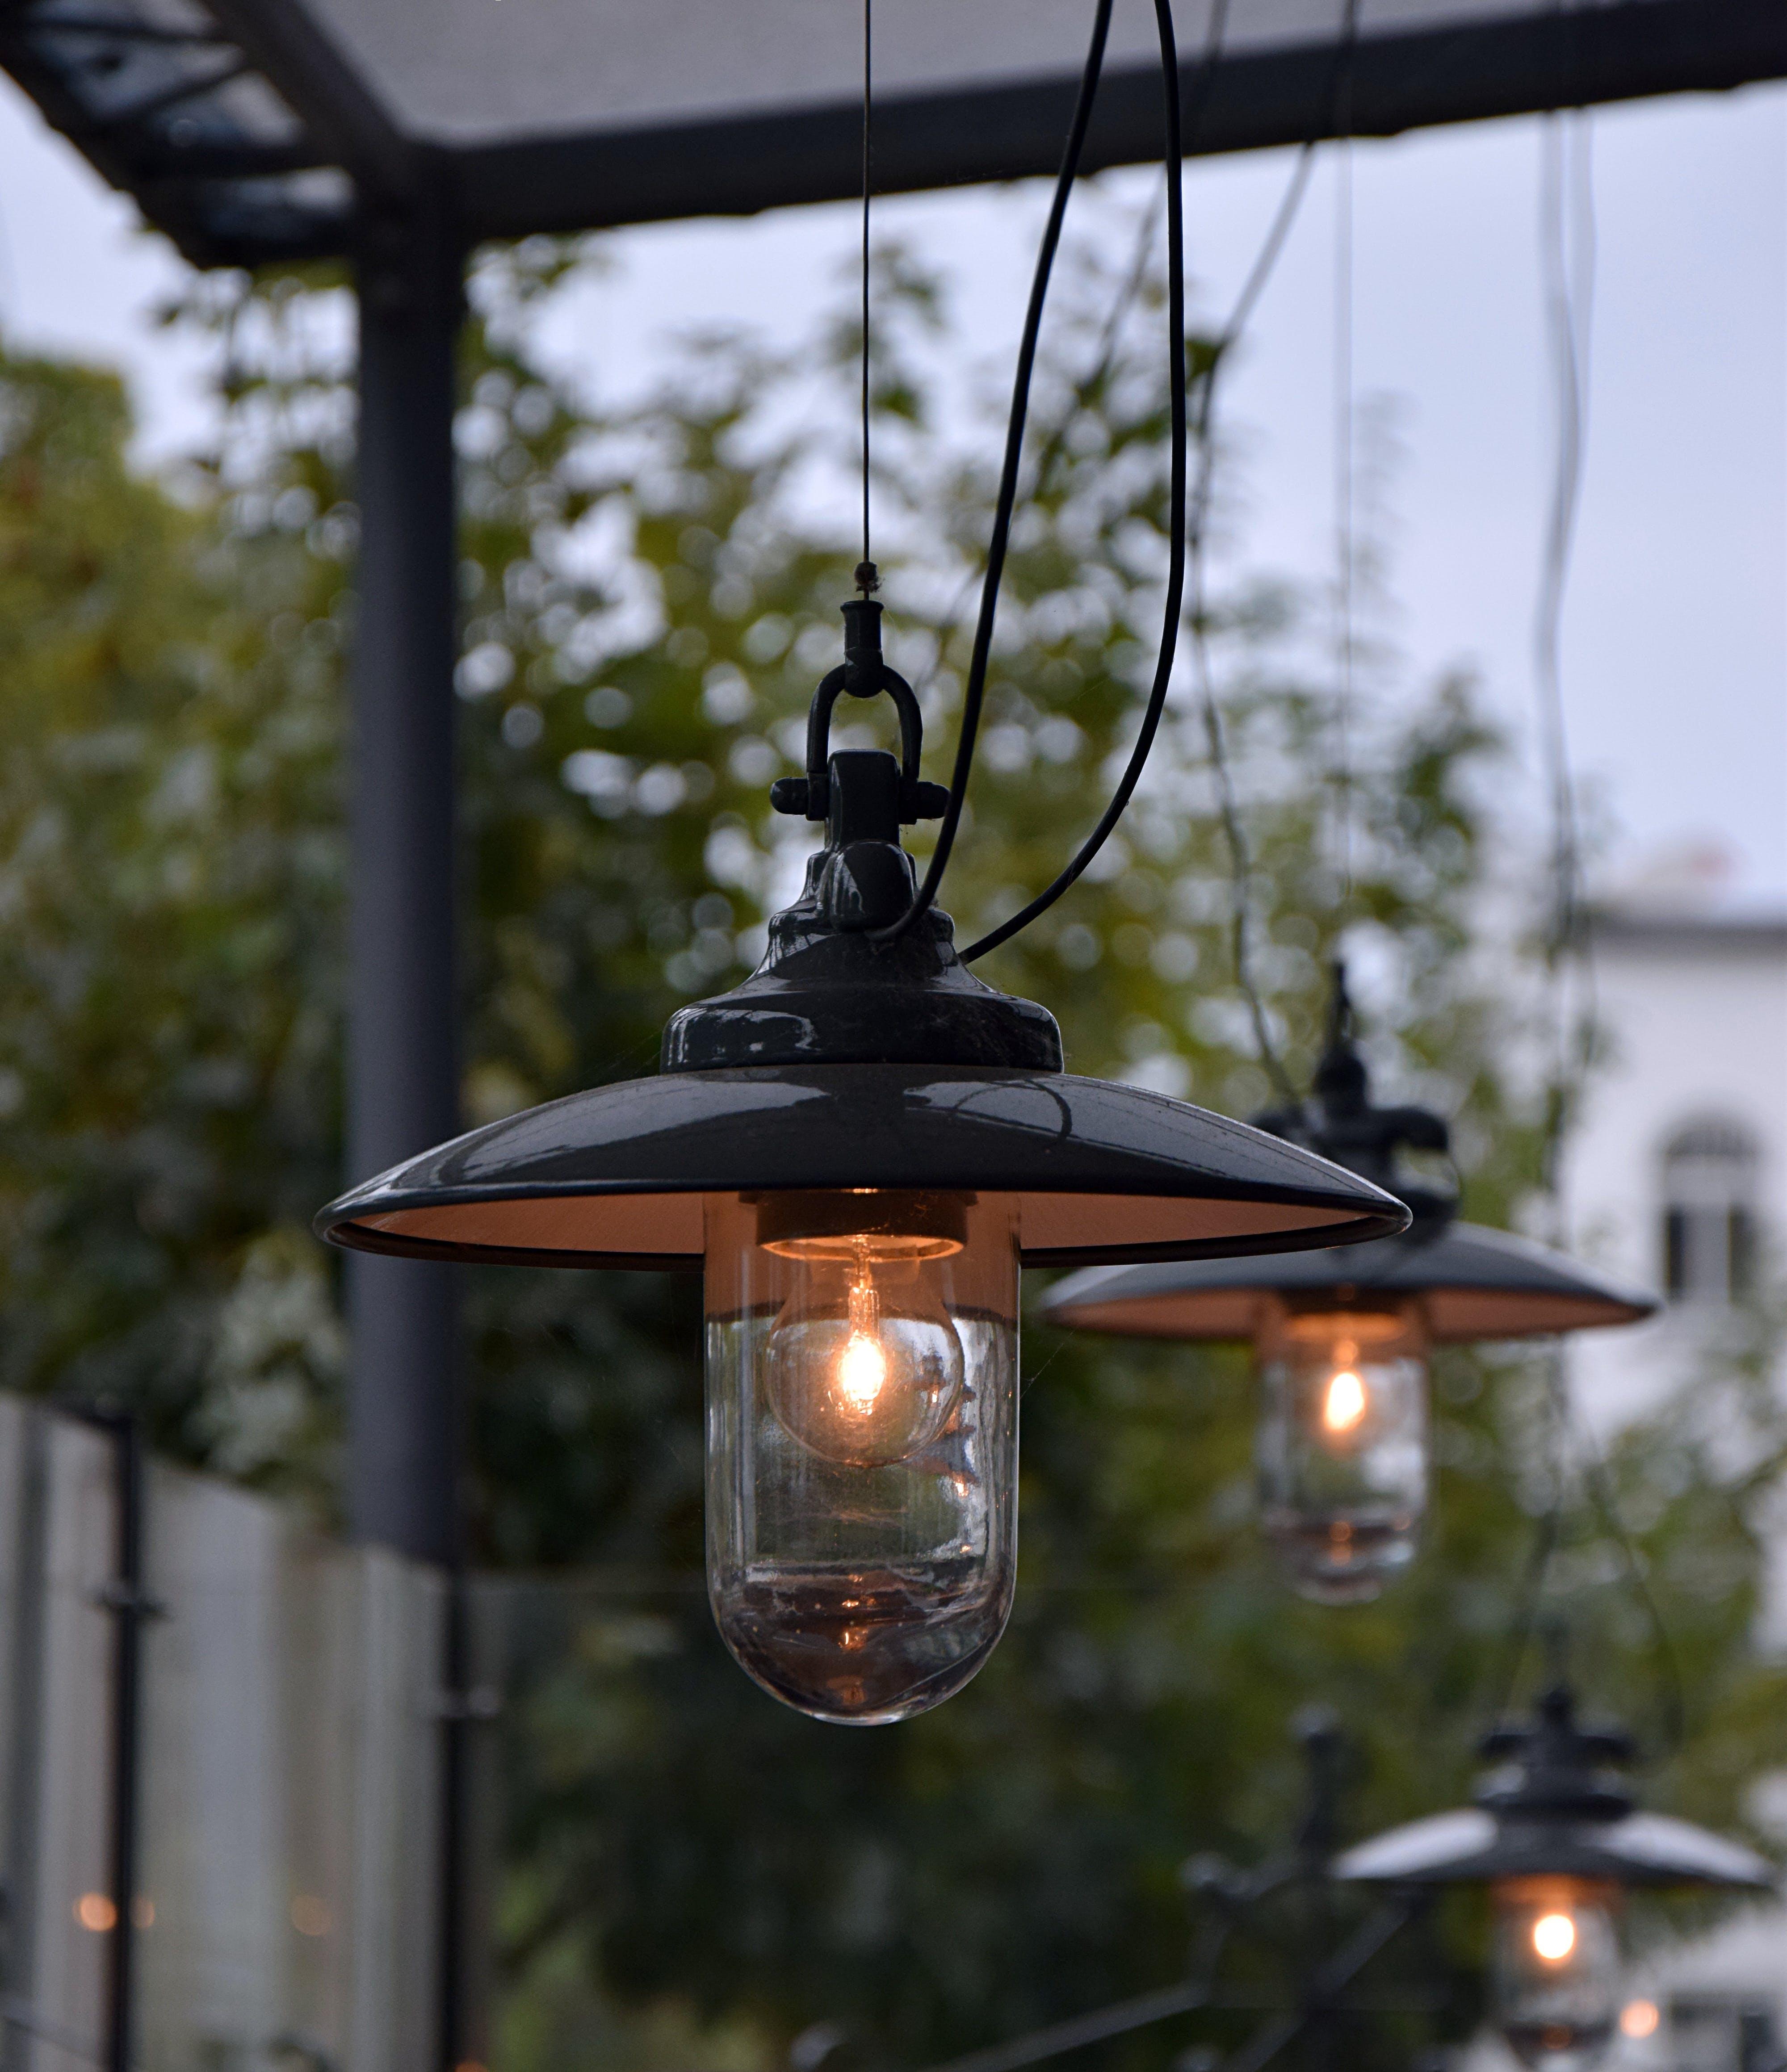 Close-up Black Pendant Lamp Near Trees